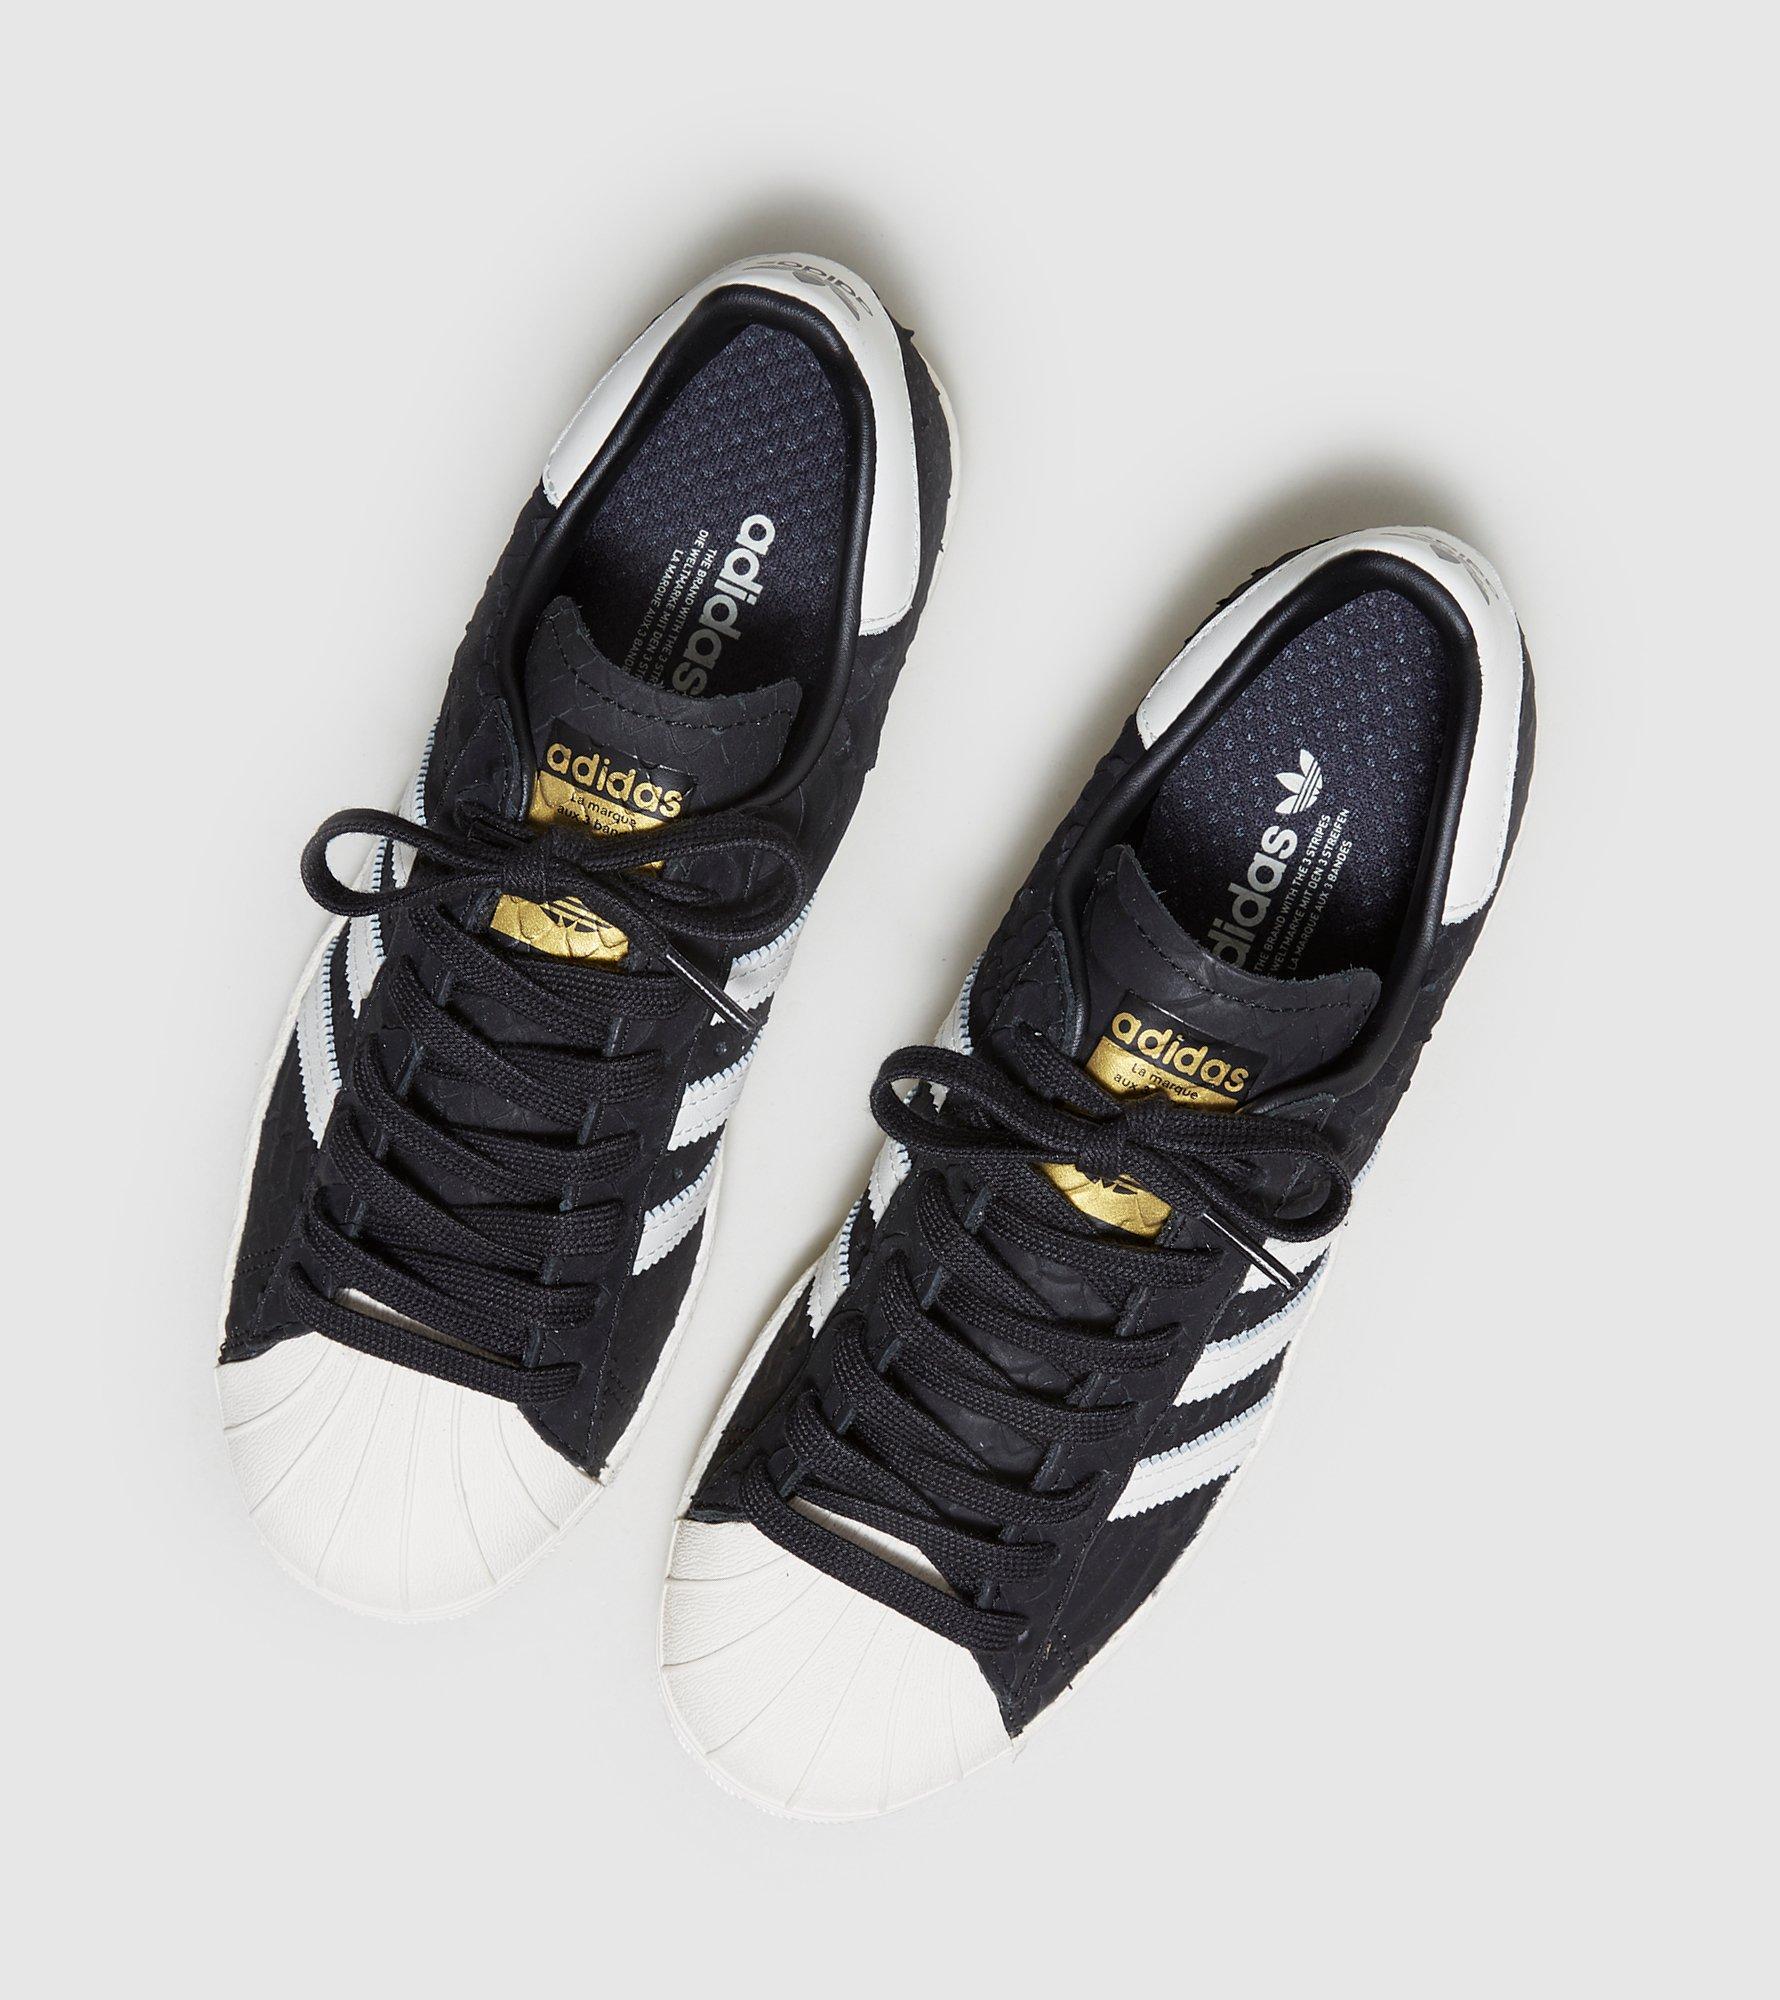 Death Run 2 Shoes Roblox Wikia Fandom Nike China Wiki Fandom Off 63 Www Gentlementours Hu